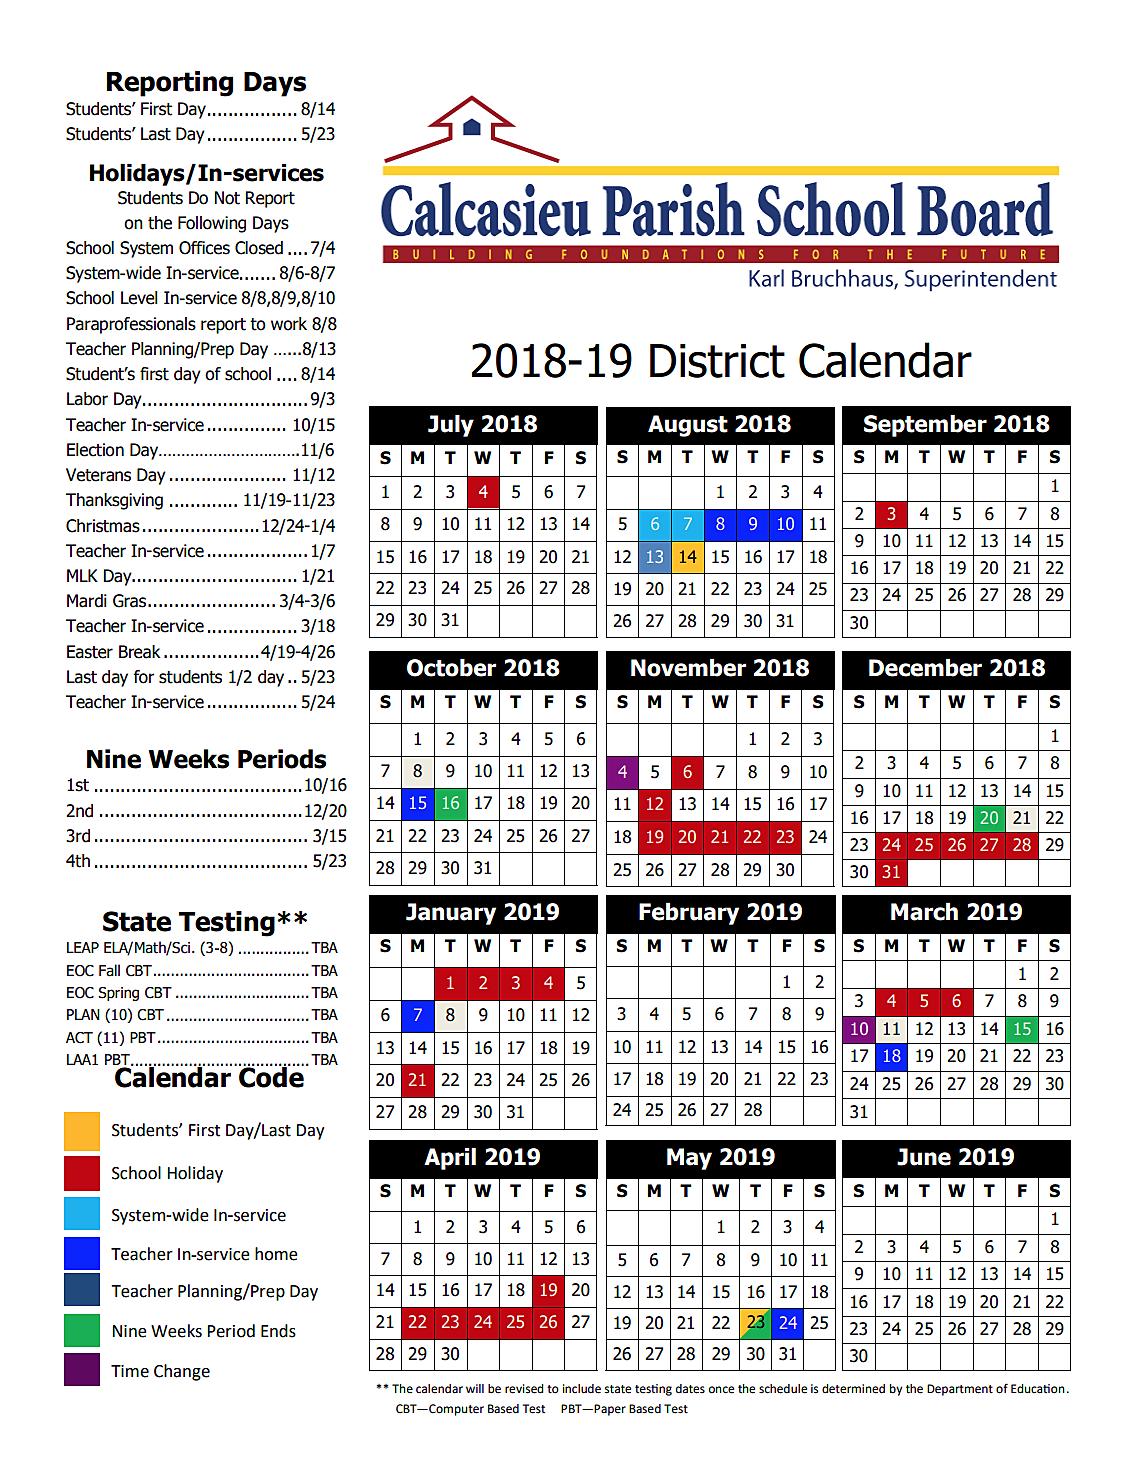 Cpsb Calendar 2020 Calcasieu Parish School Board 2018 19 District Calendar